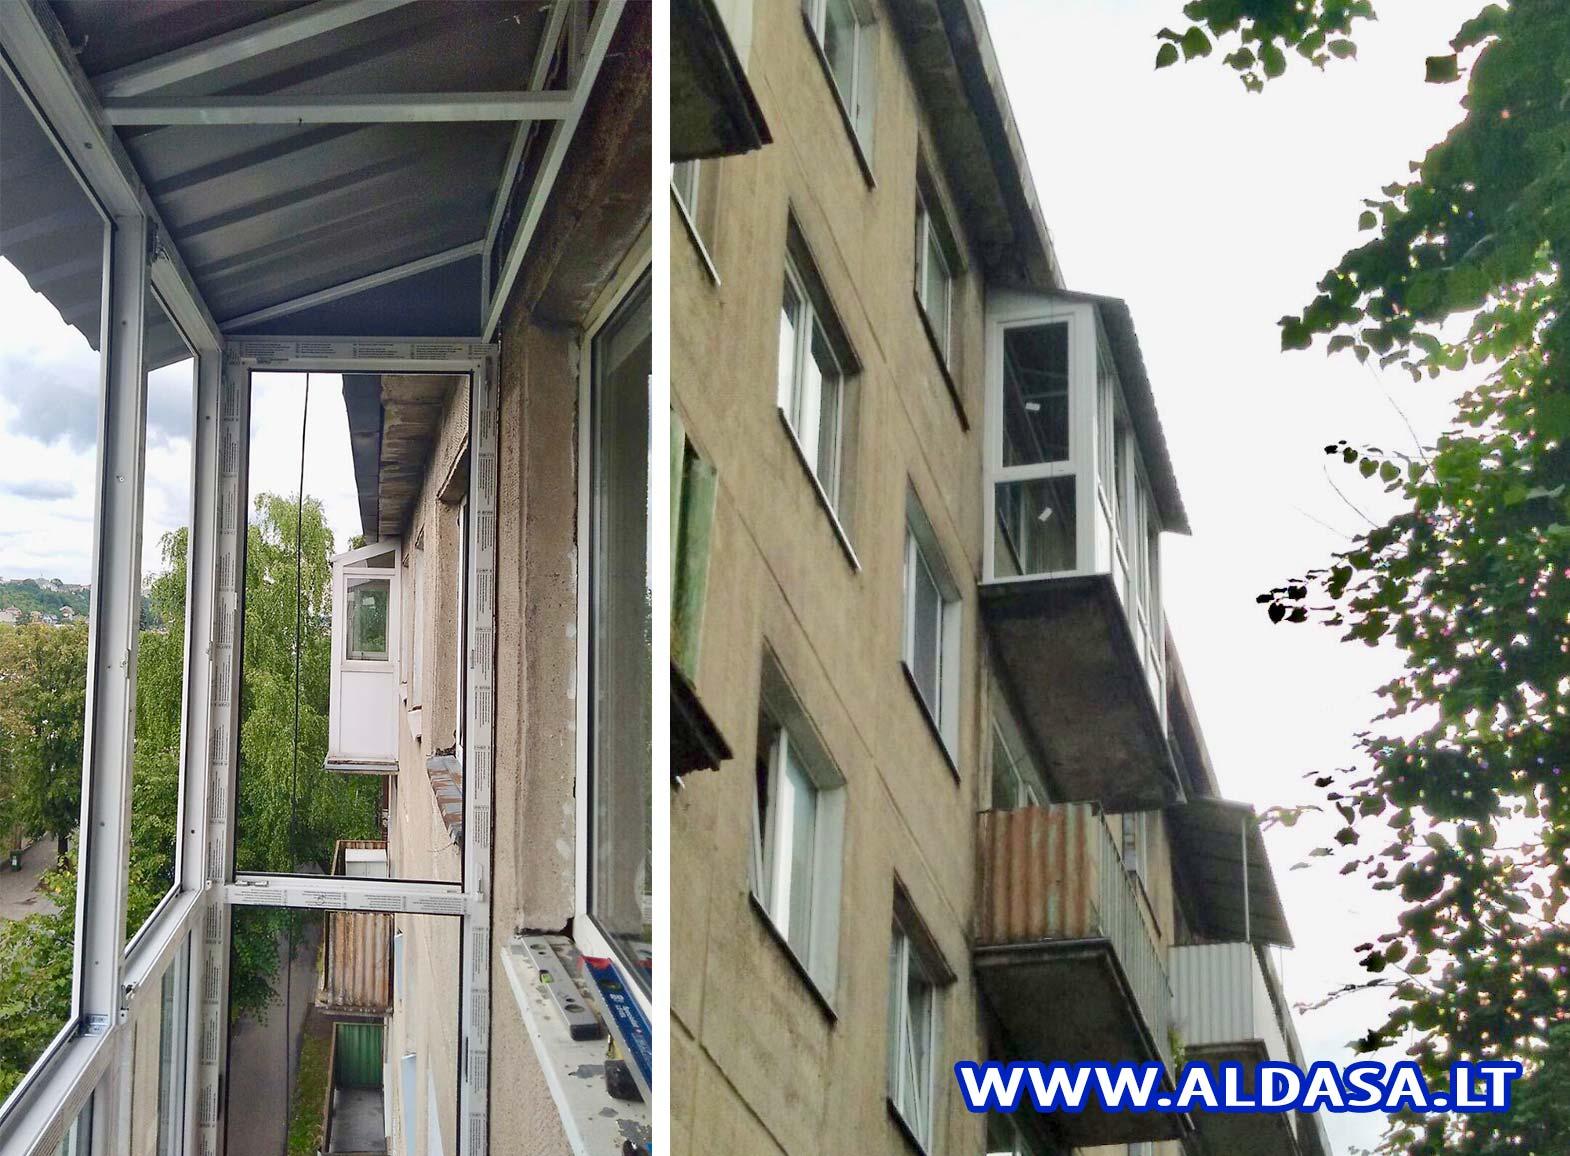 balkonai-8428-8429-2